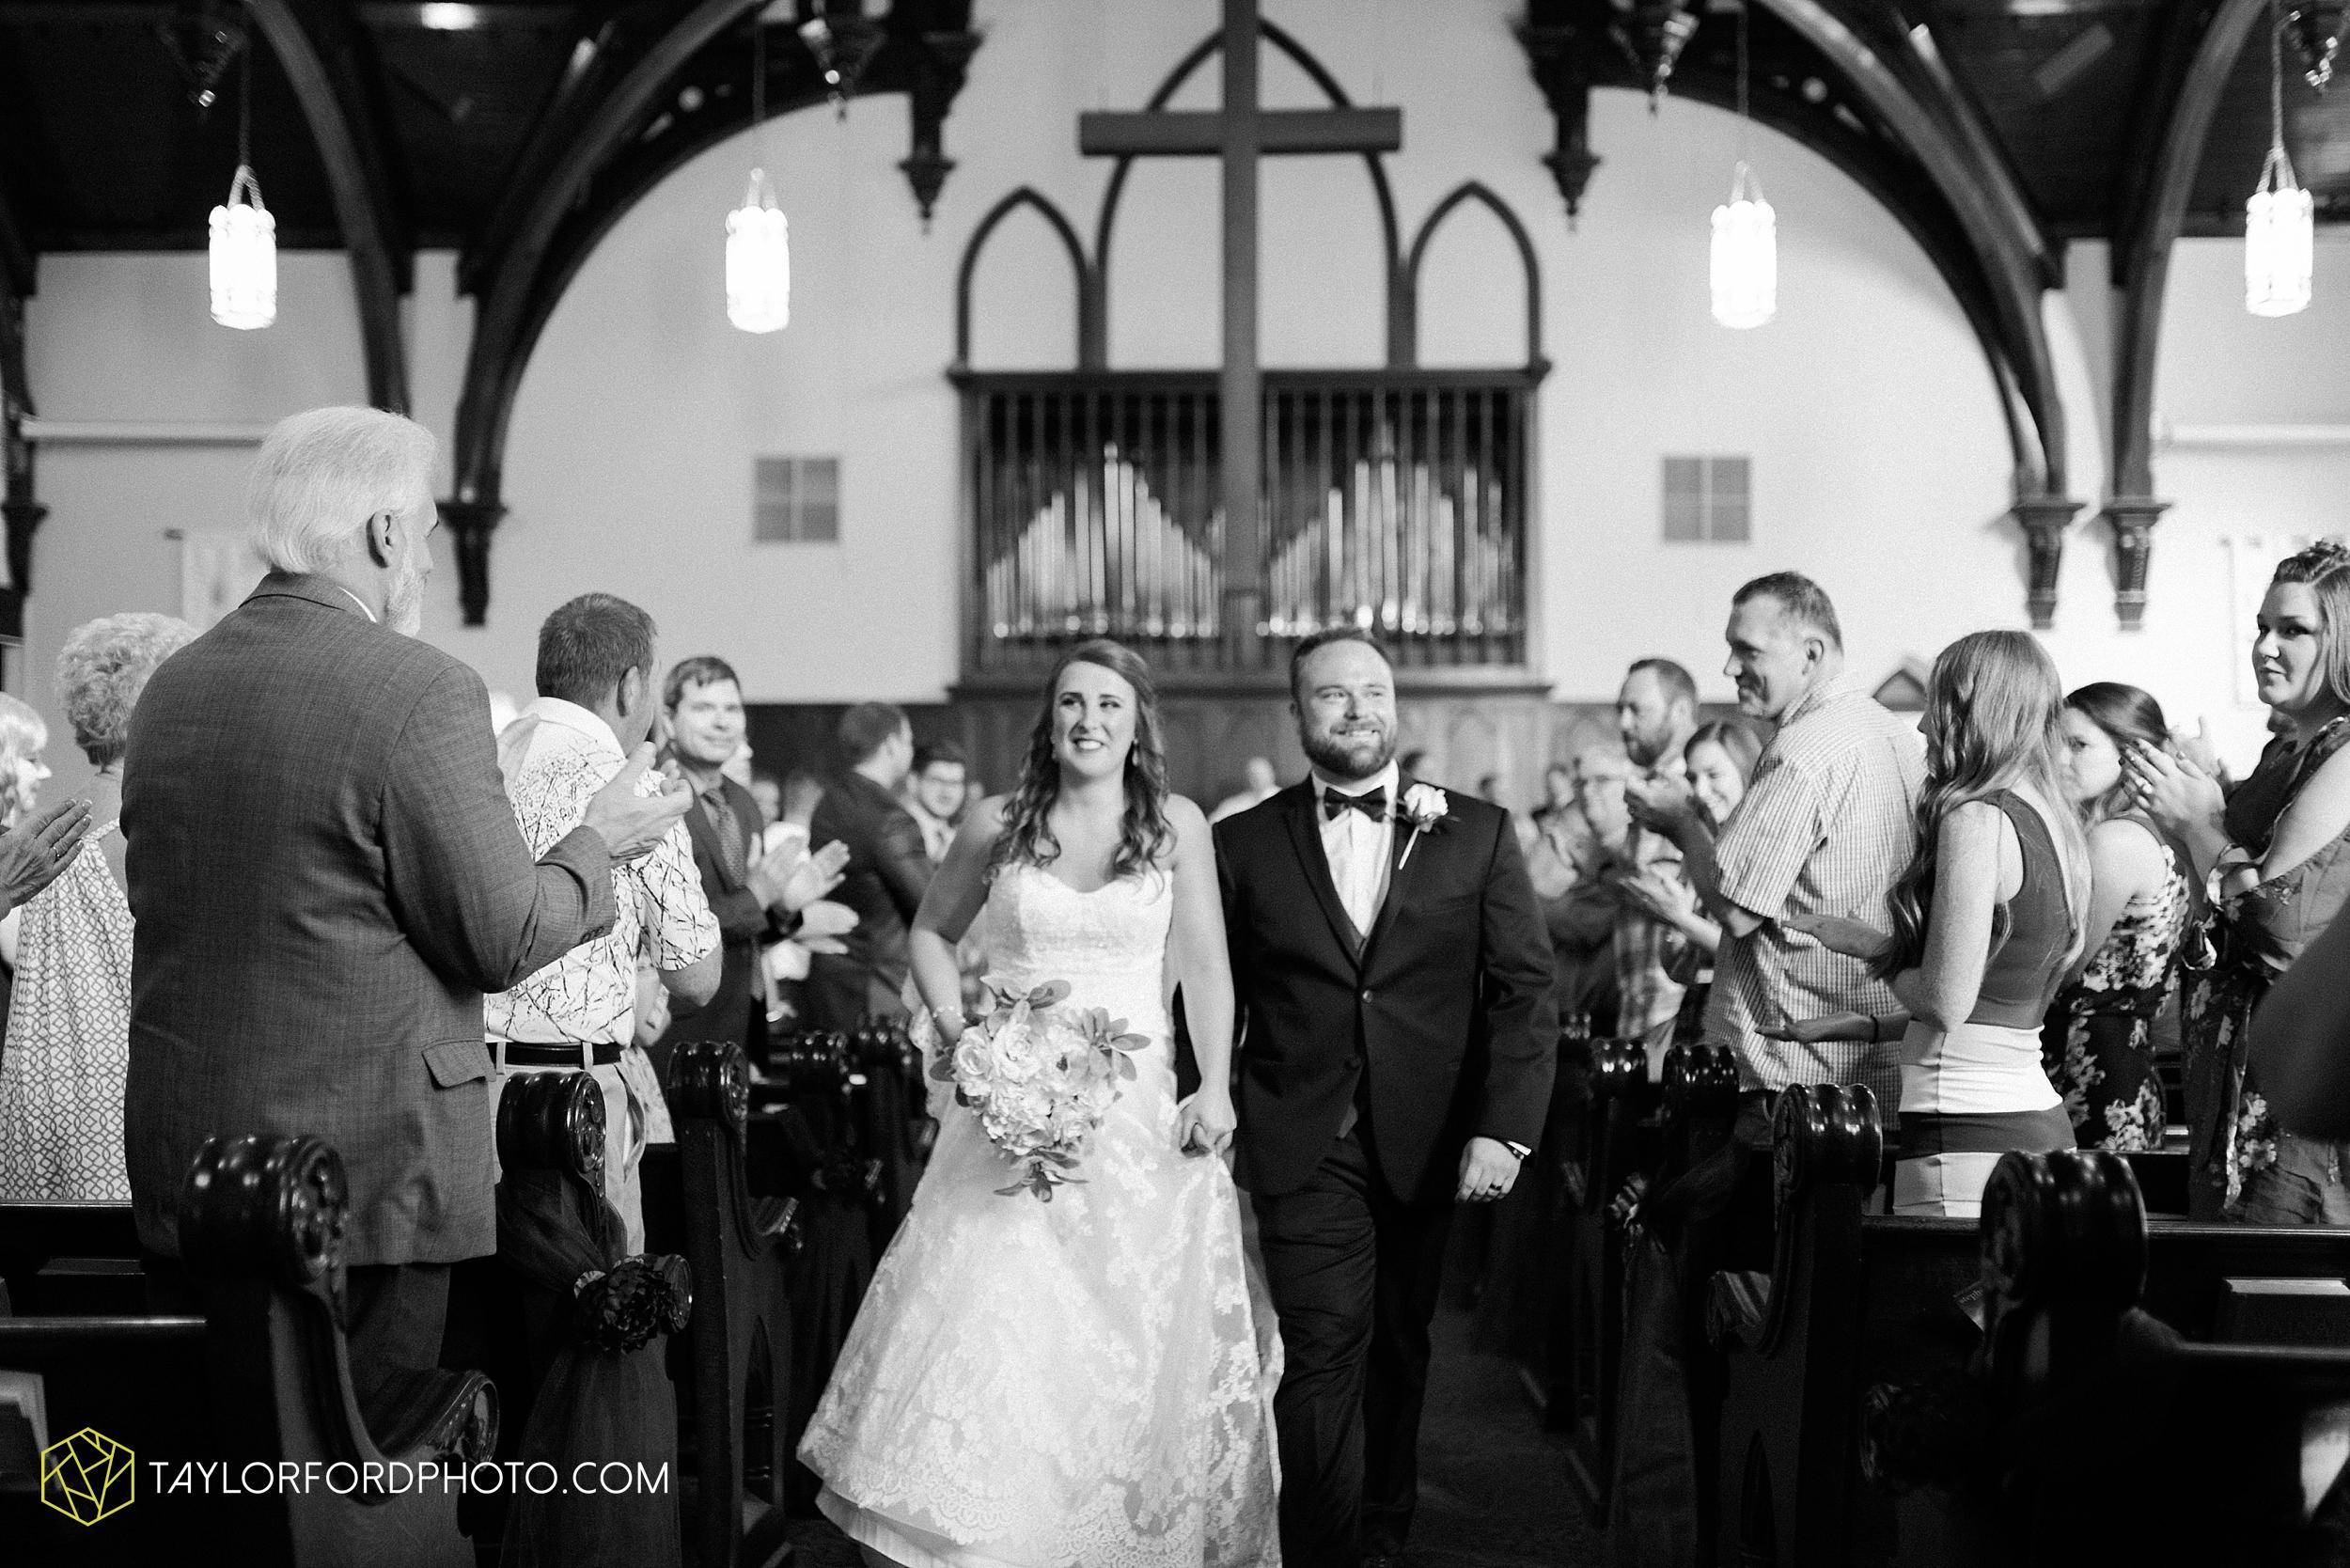 chelsey-zosh-jackson-young-first-united-methodist-church-senior-center-van-wert-ohio-wedding-photographer-taylor-ford-photography_0073.jpg